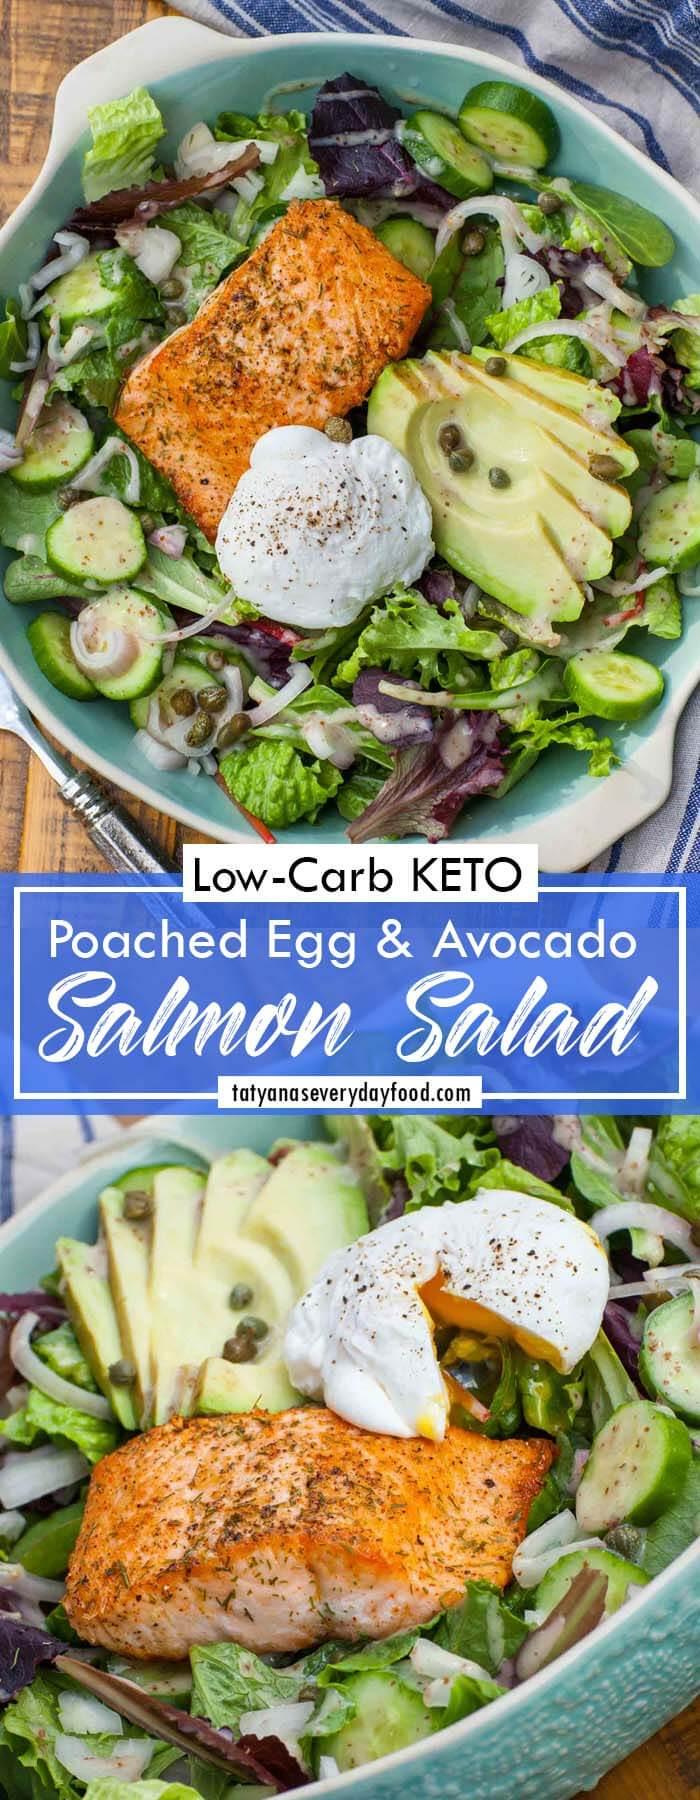 Egg & Avocado Salmon Salad Recipe